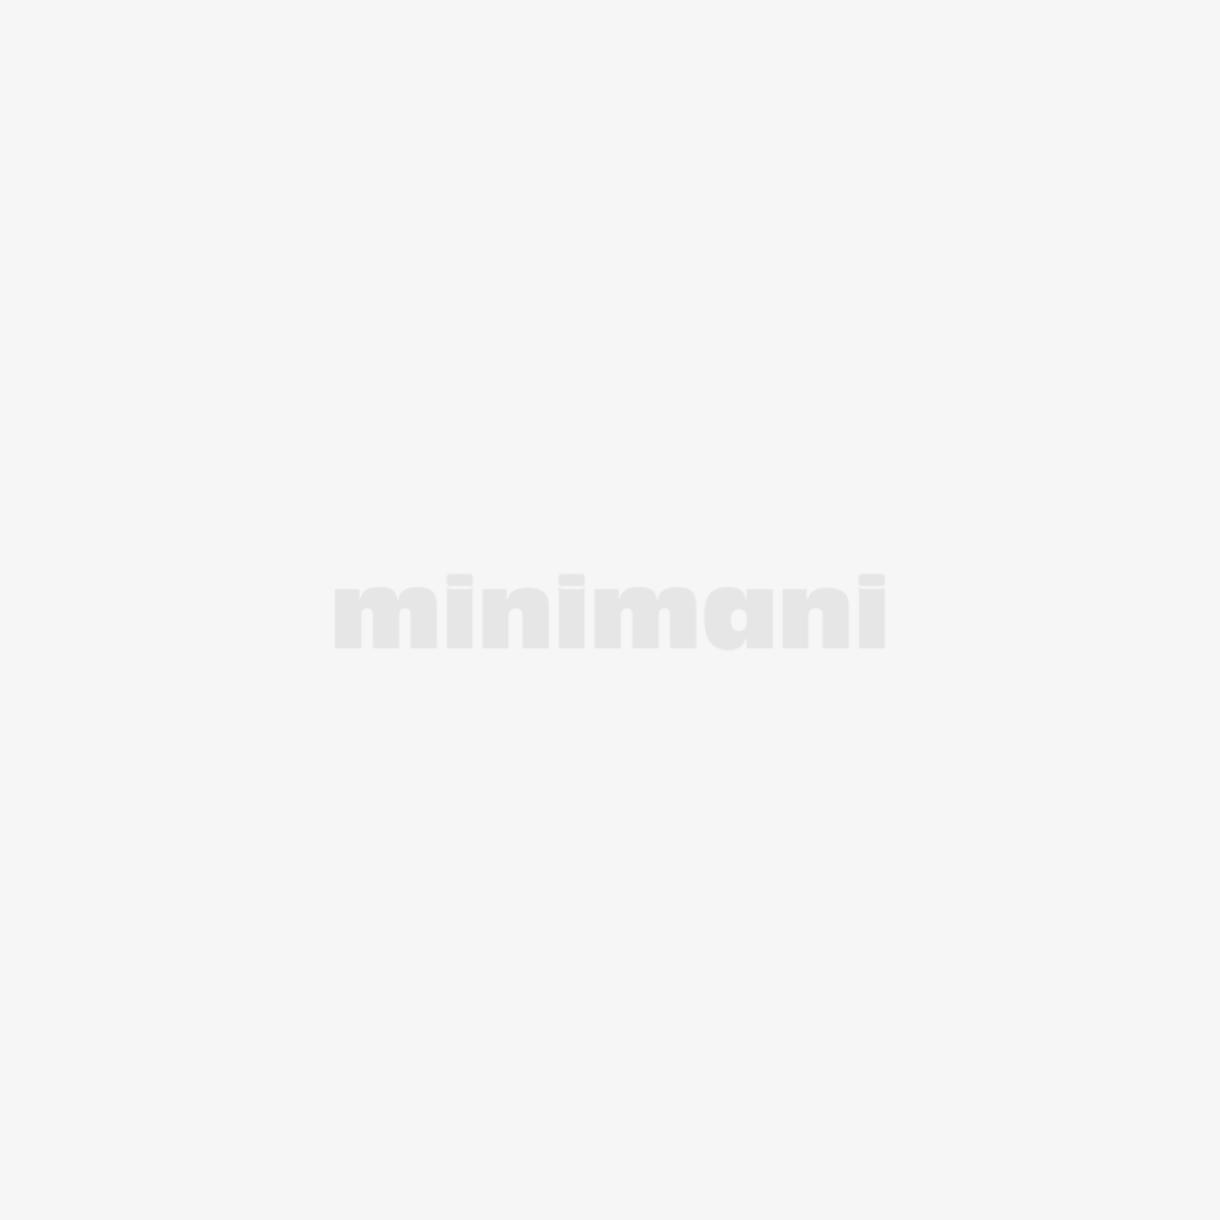 BRAUN LADYSHAVER LS5160